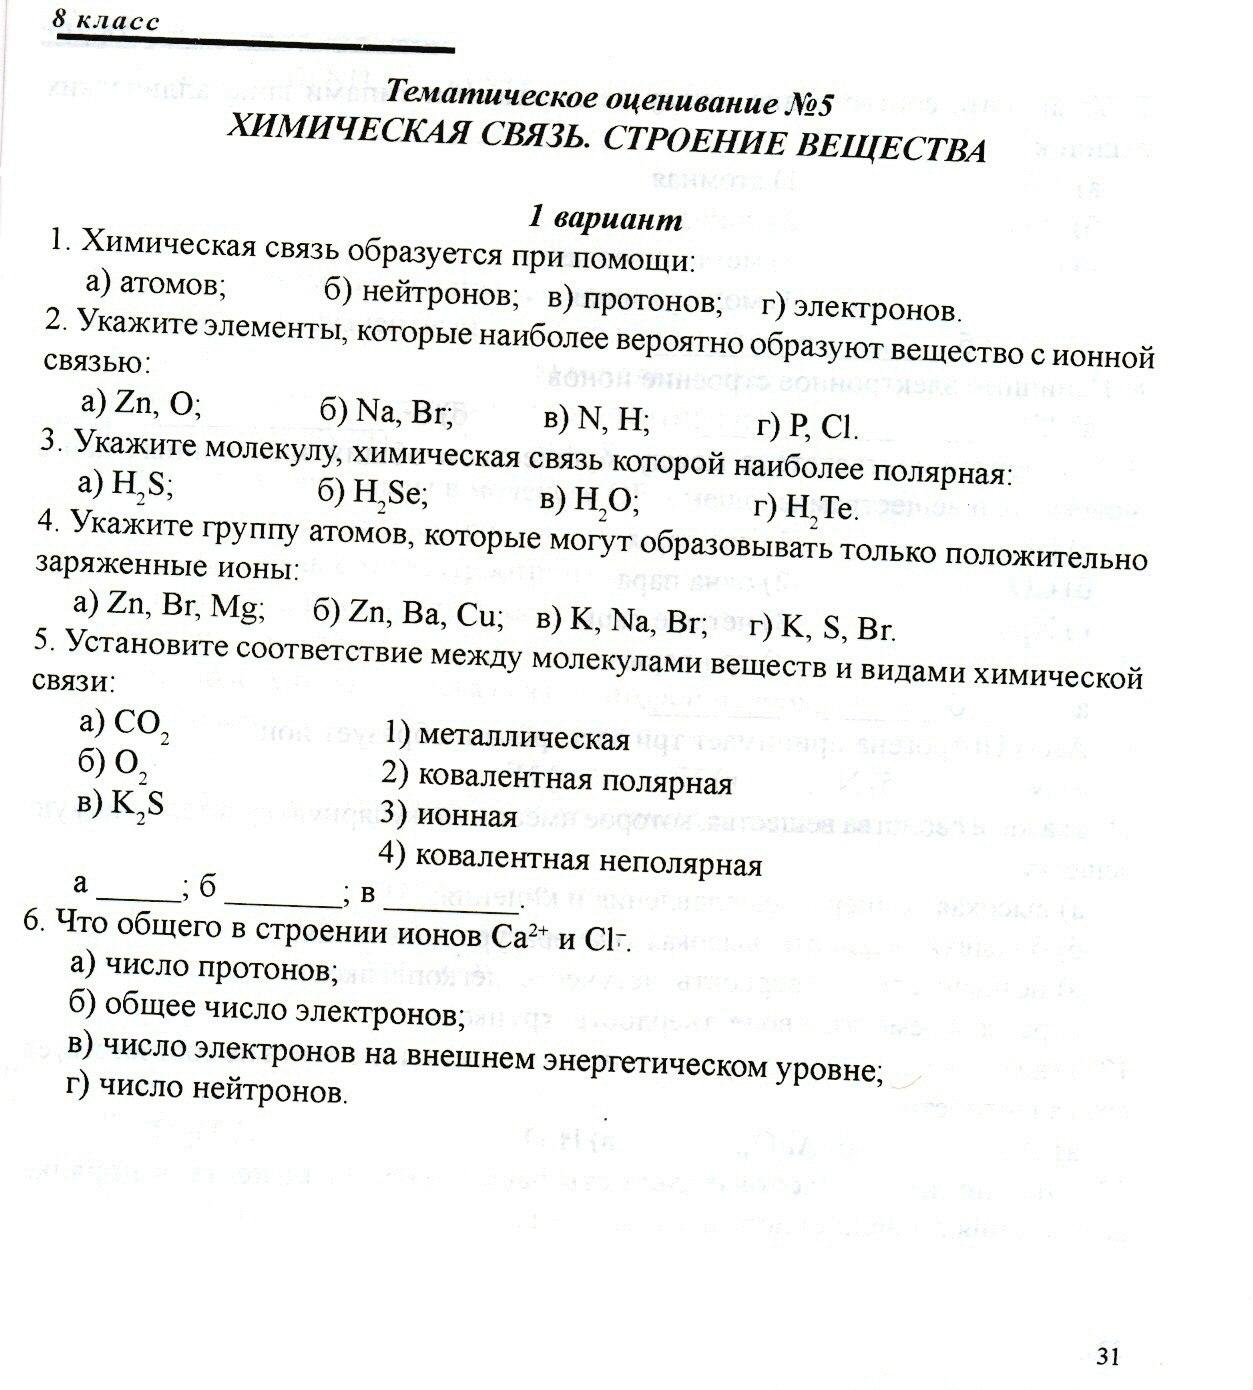 w_cd7a7b3c.jpg